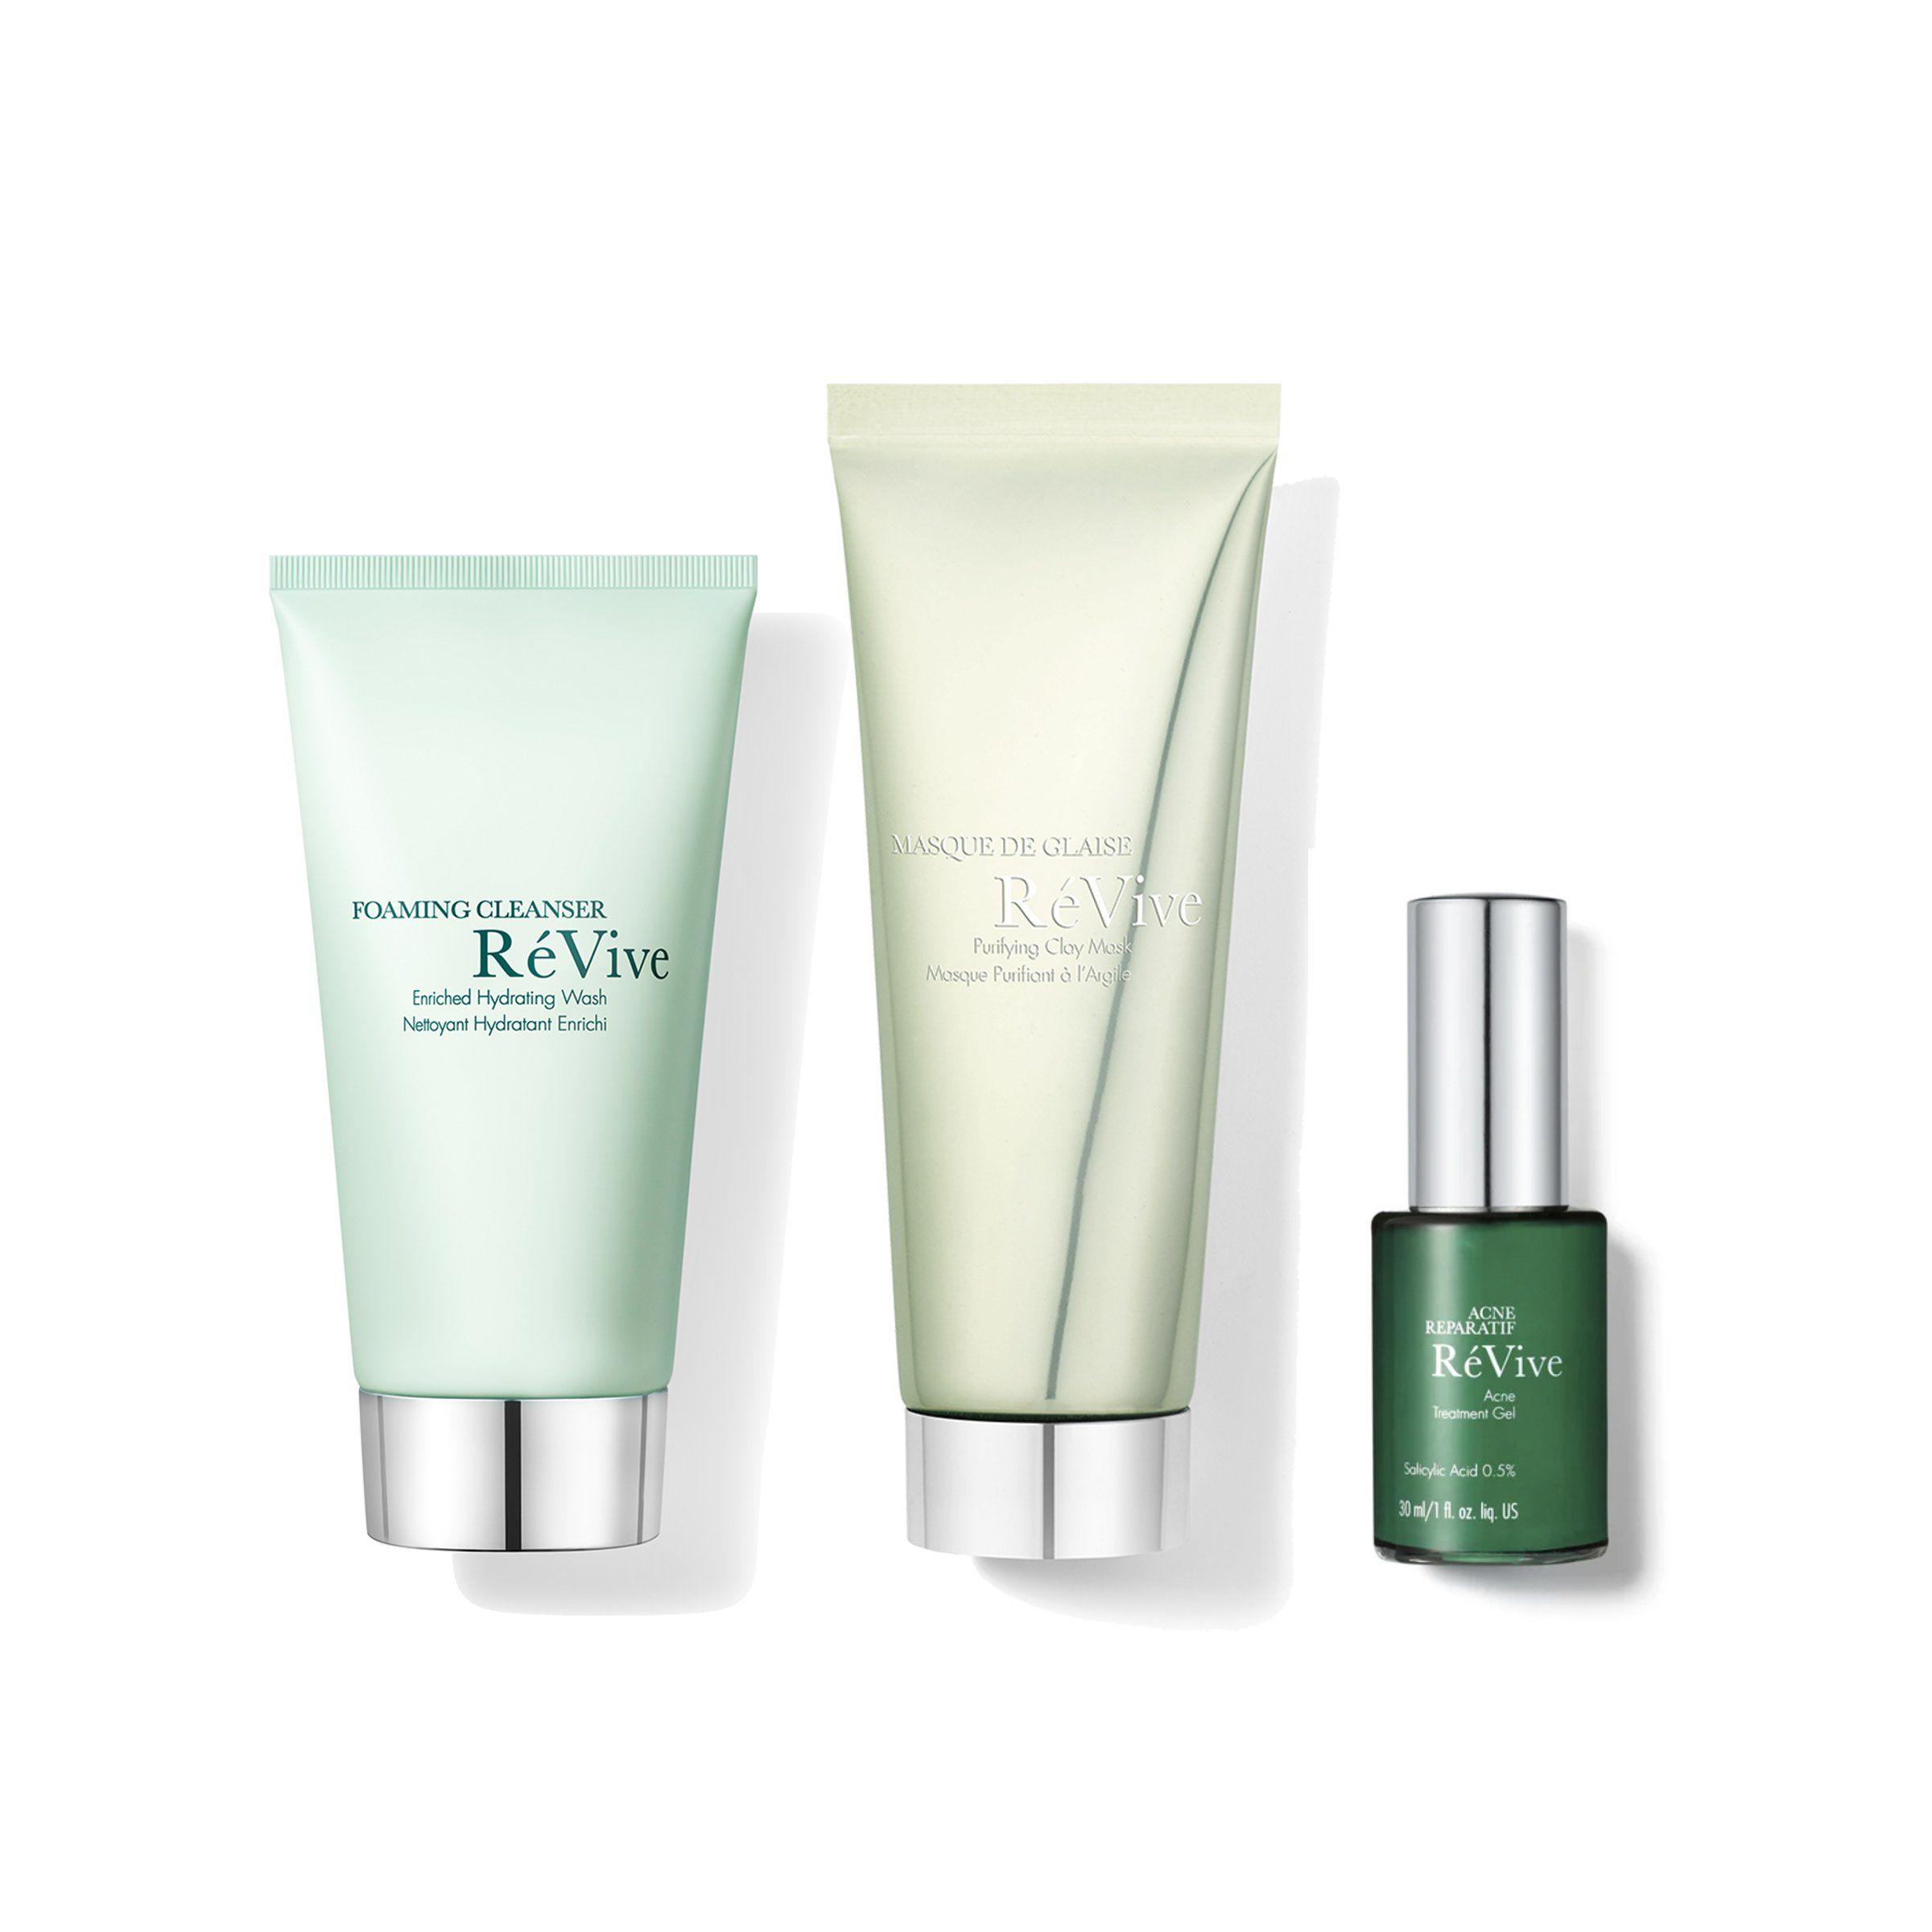 Skin Detox / Skin Savers Duo